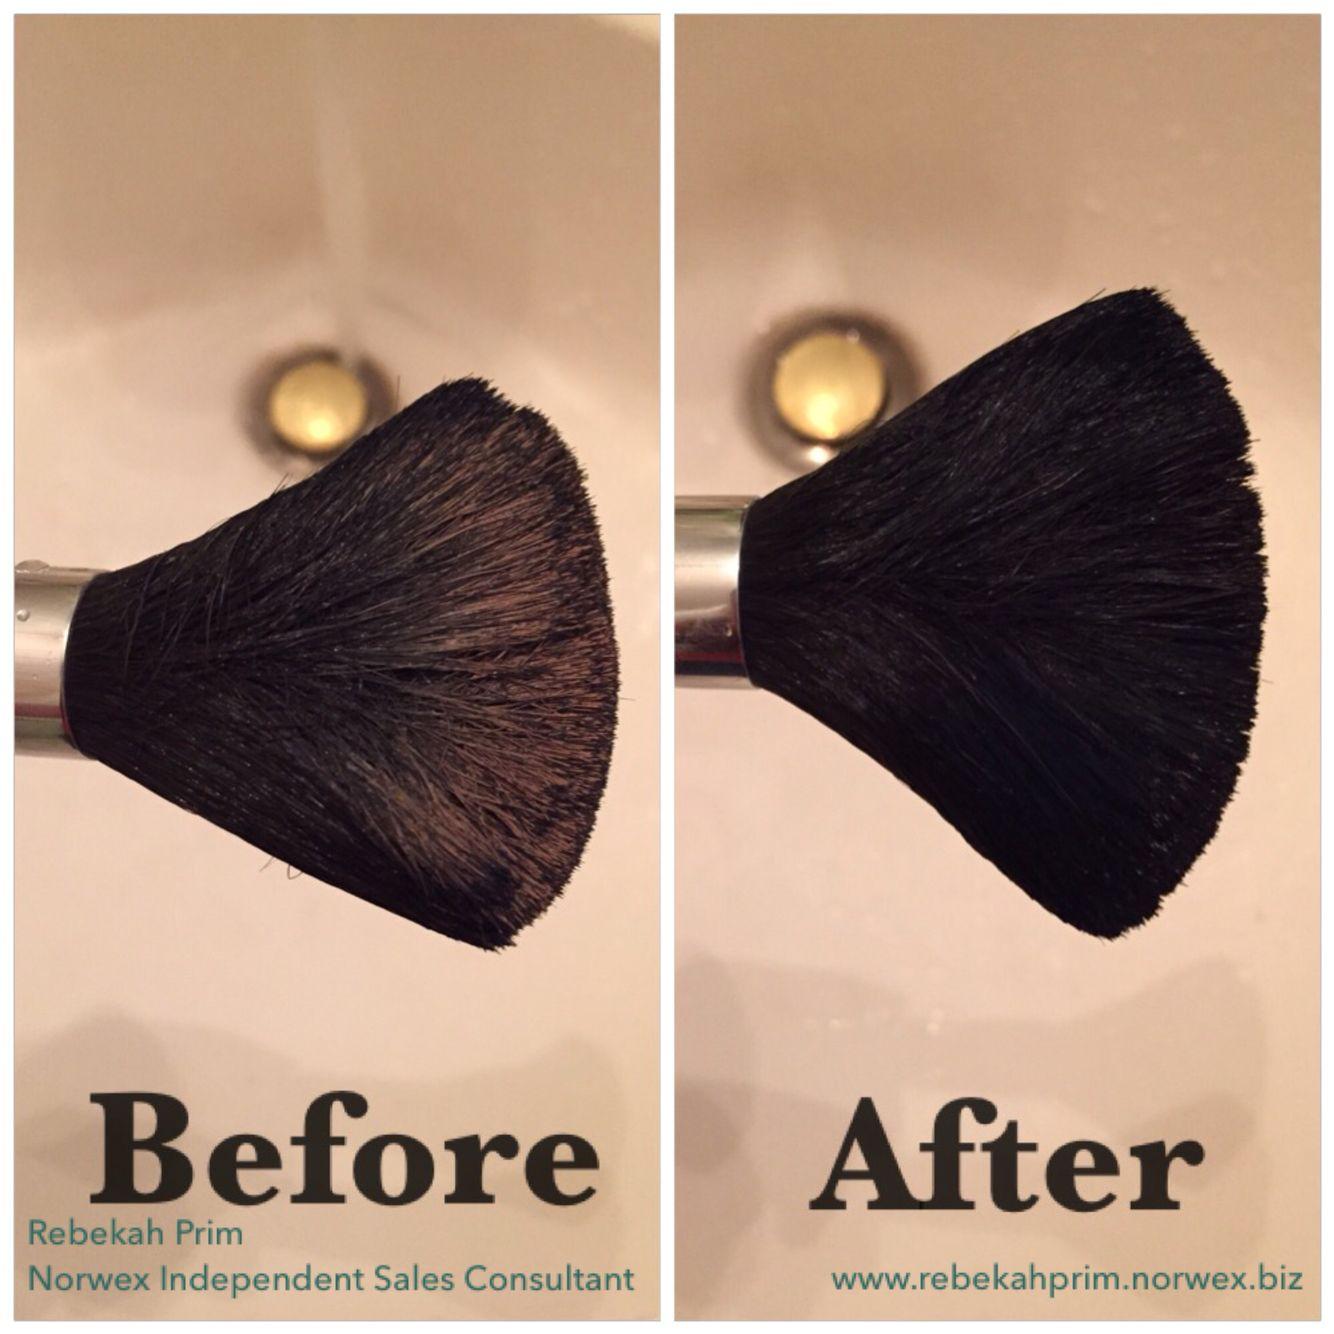 Love using Norwex dishwashing soap to clean makeup brushes